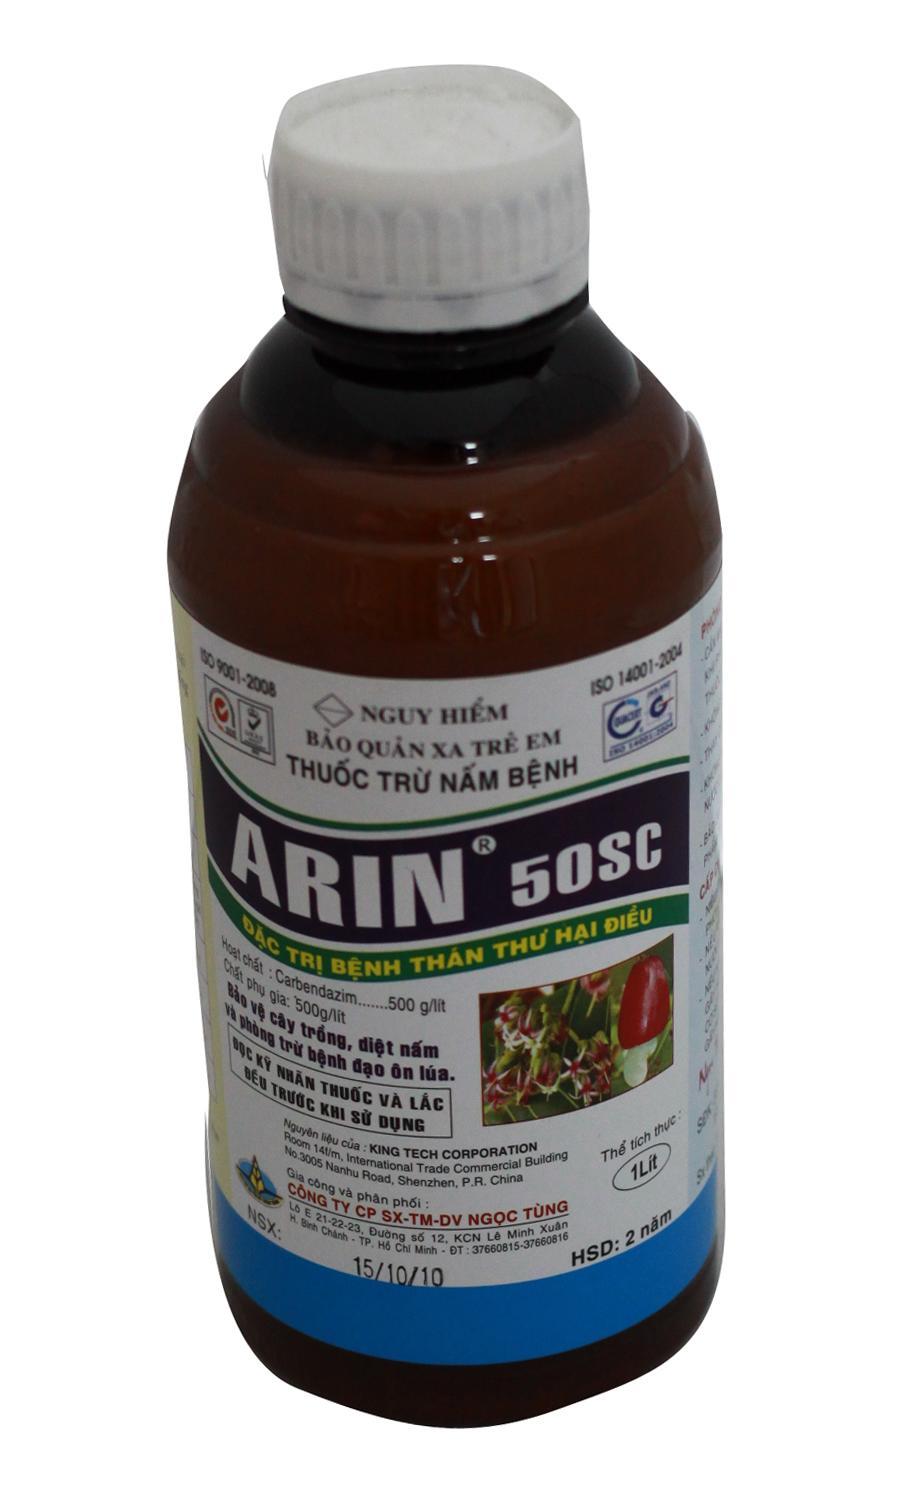 ARIN 50SC 1 lít